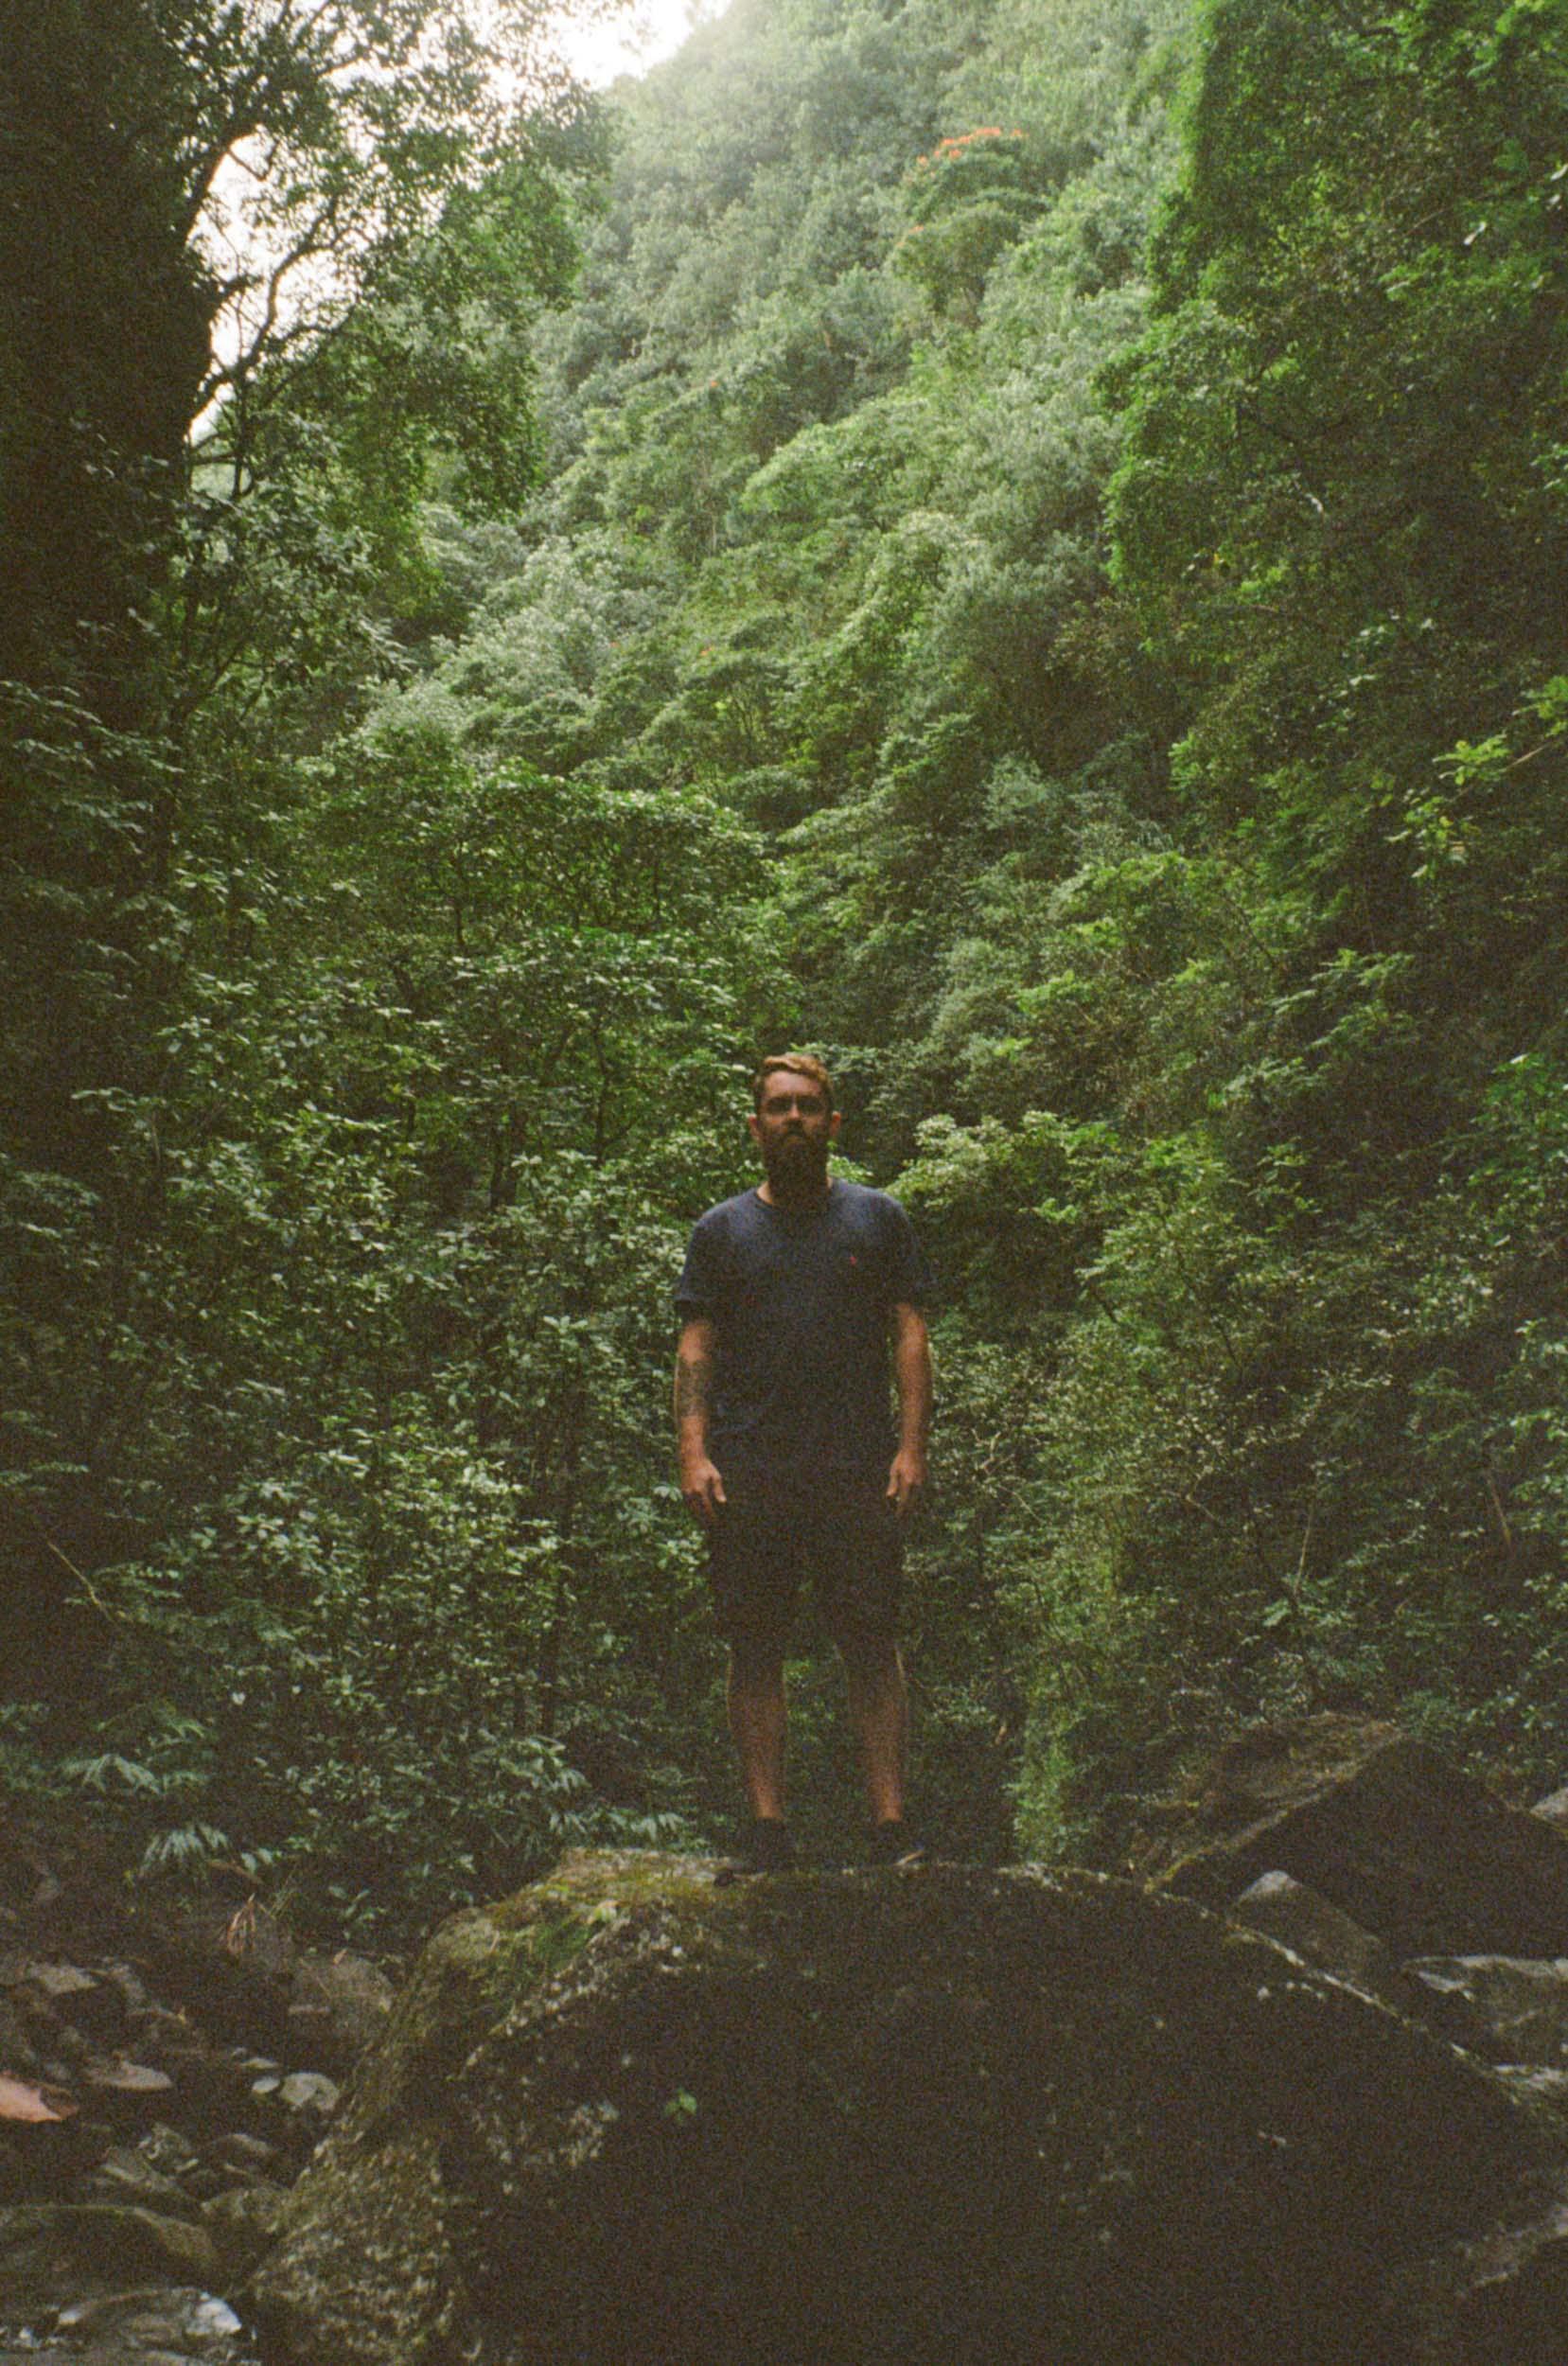 35mm_Maui-8.jpg